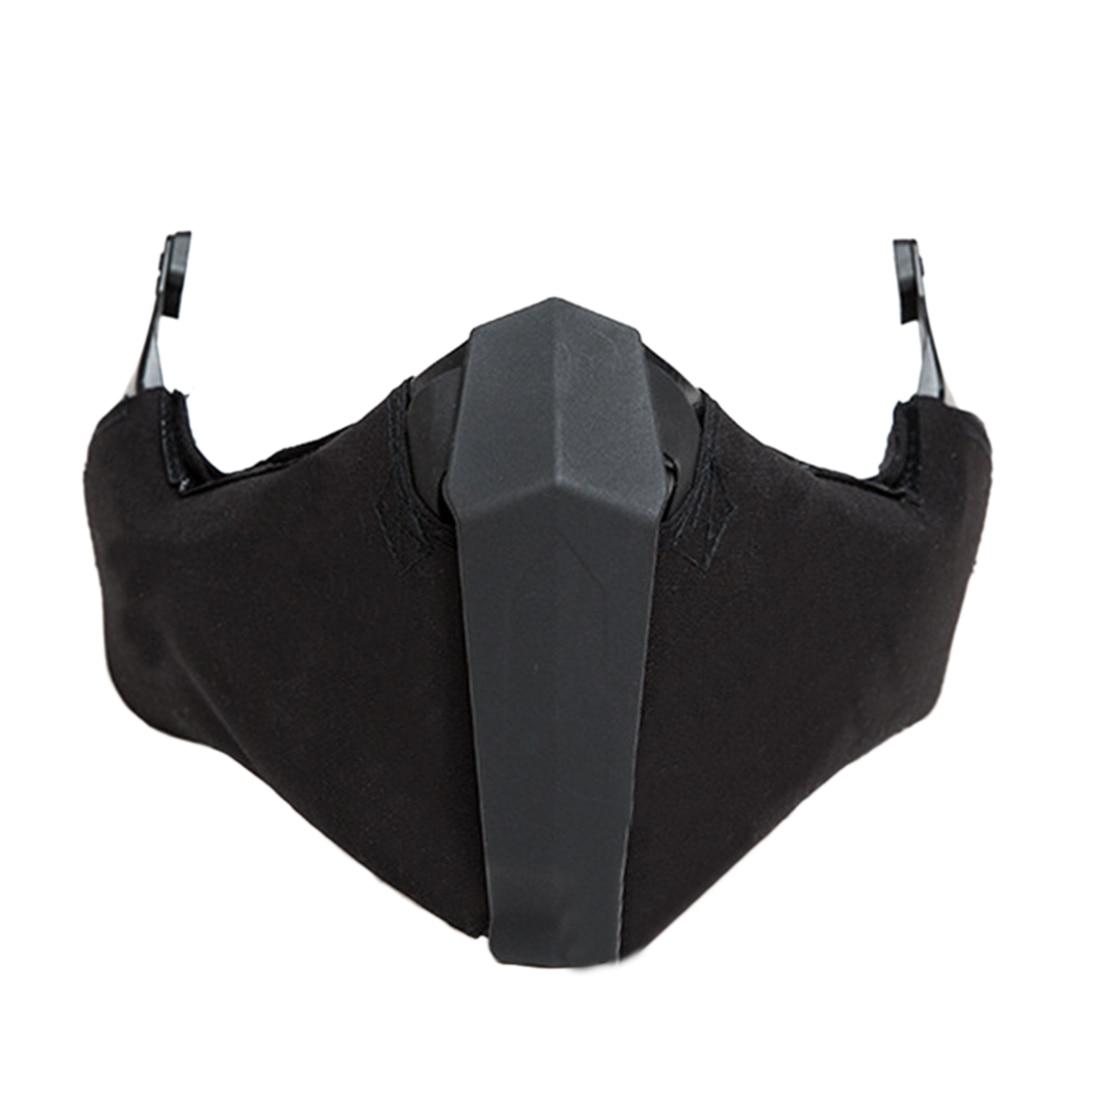 FMA Outdoor Activity Airsoft Breathability Mandible Half Face Mask For Helmet Rail - Black